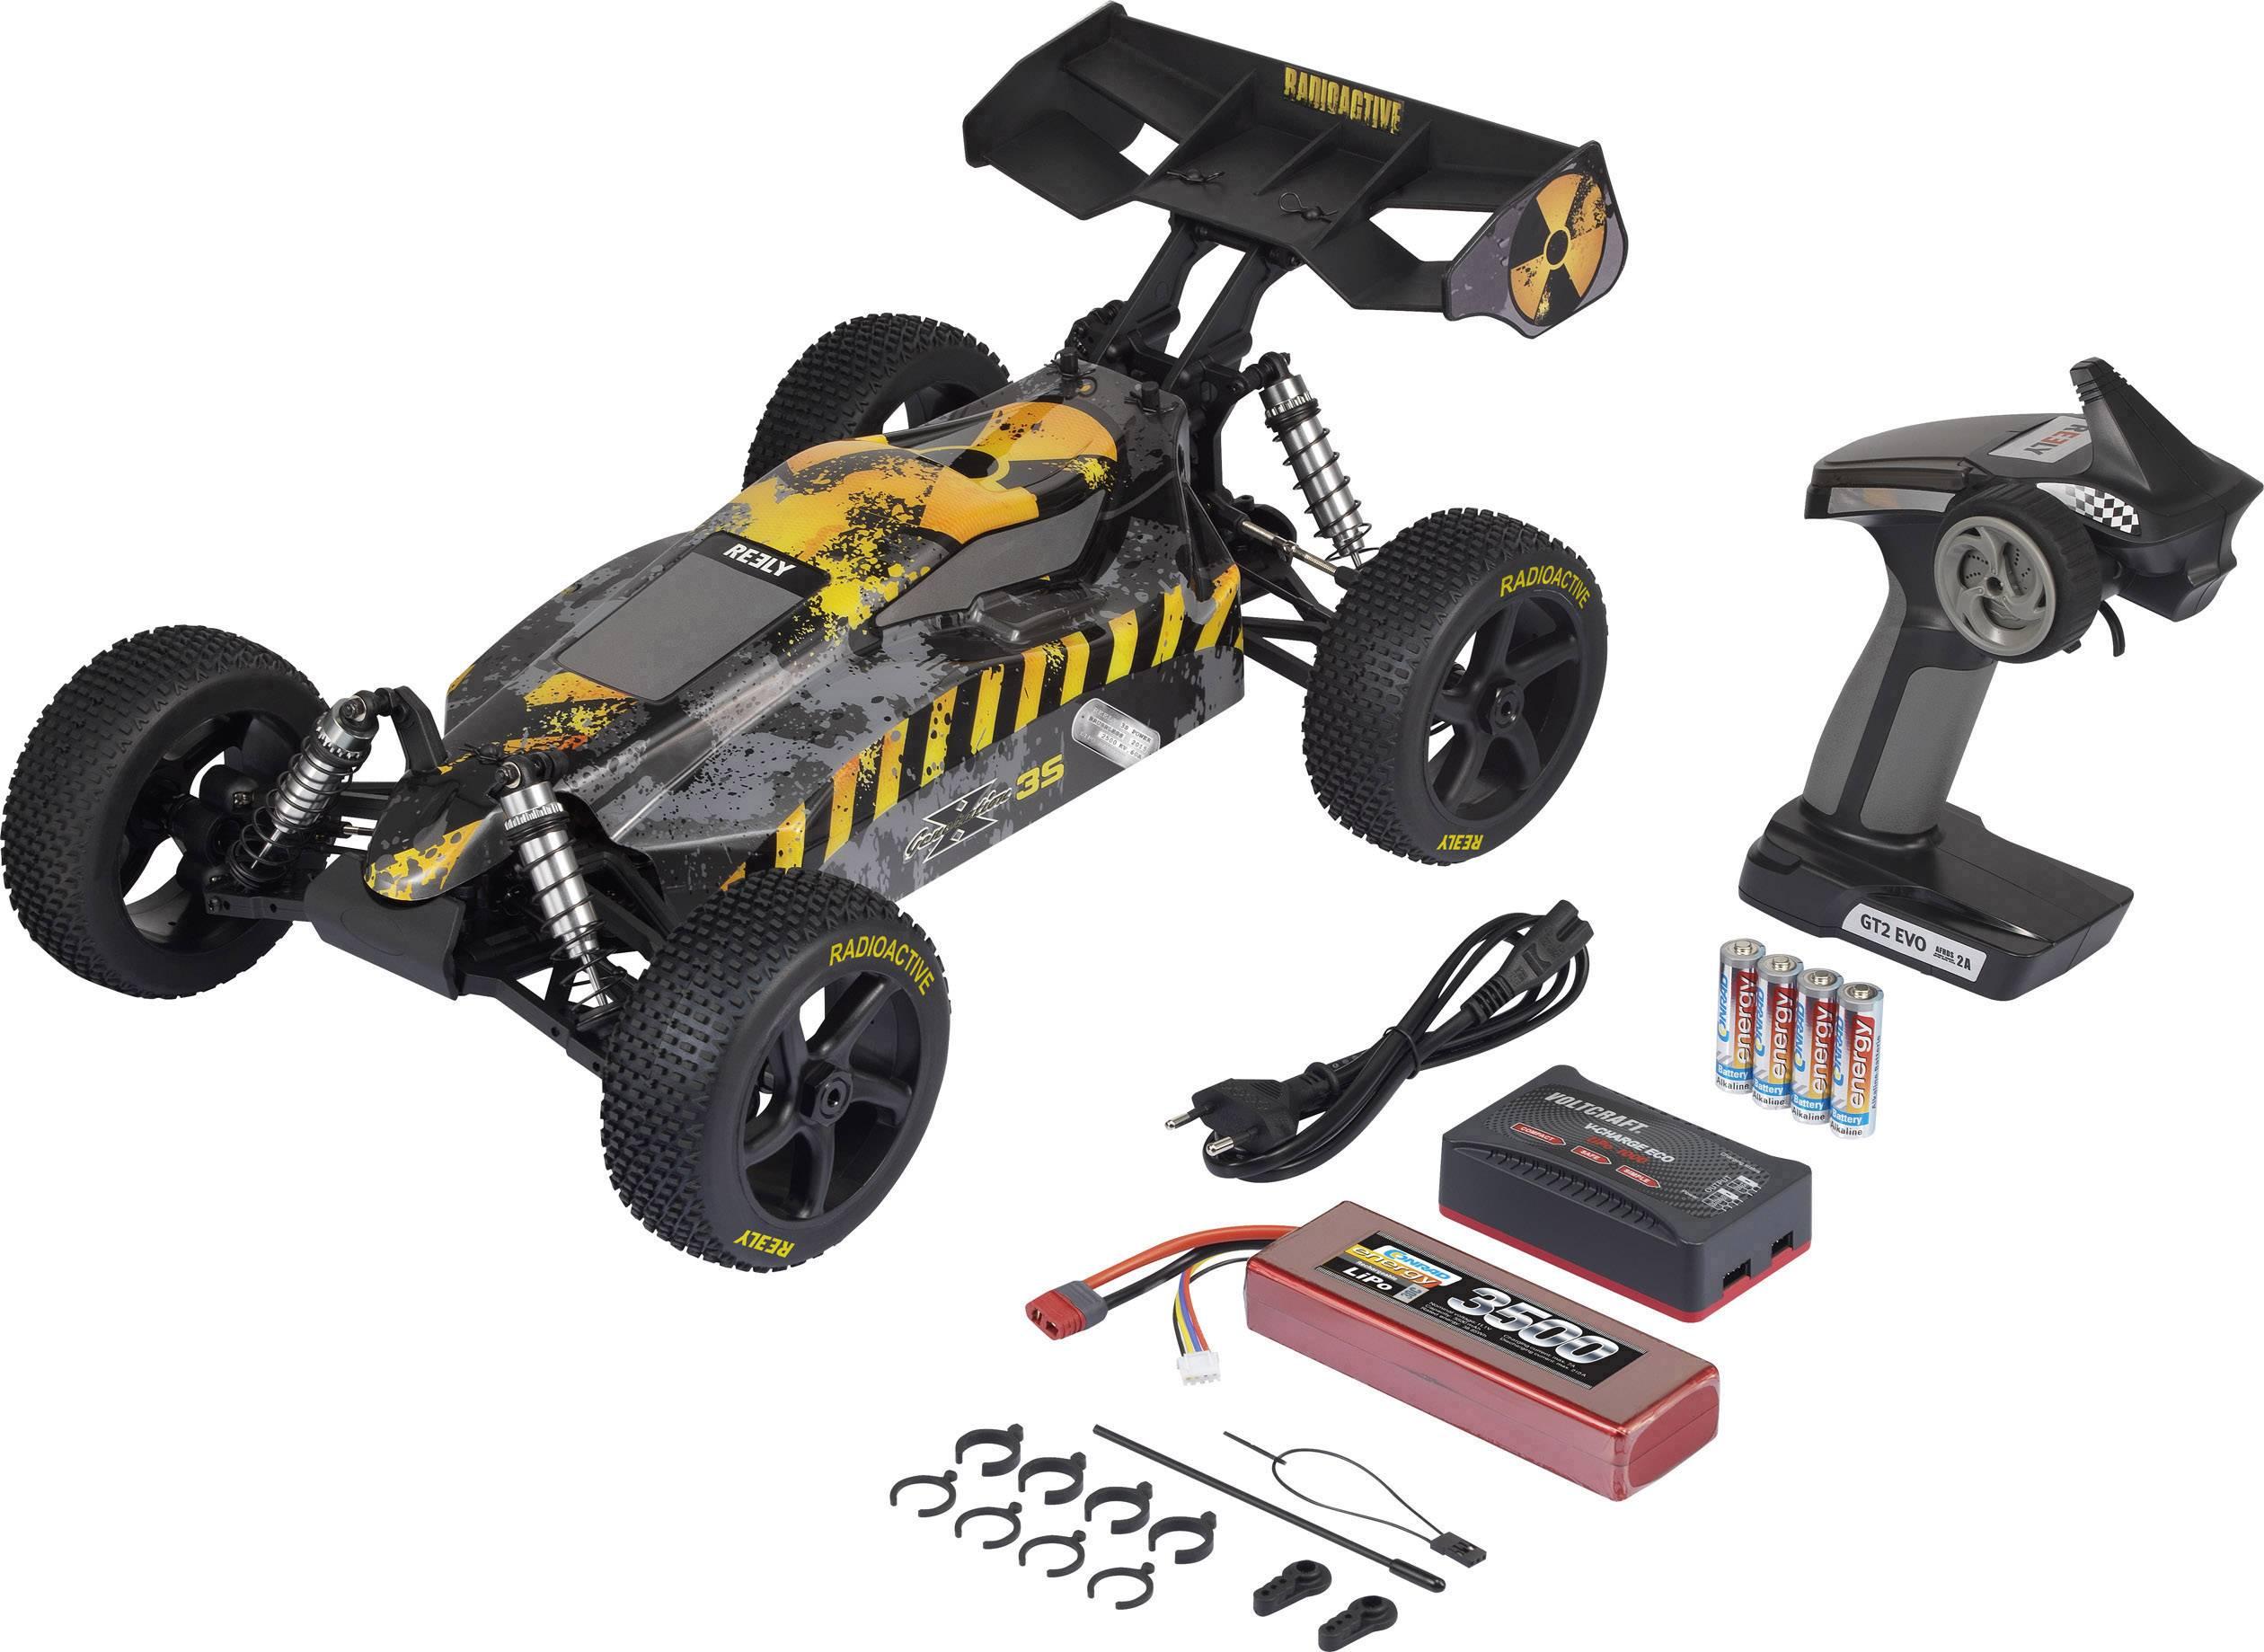 Stoßdämpfer 1 STÜCK Alu hinten für Reely Elektro Buggy Dart 1:10 Brushless Car